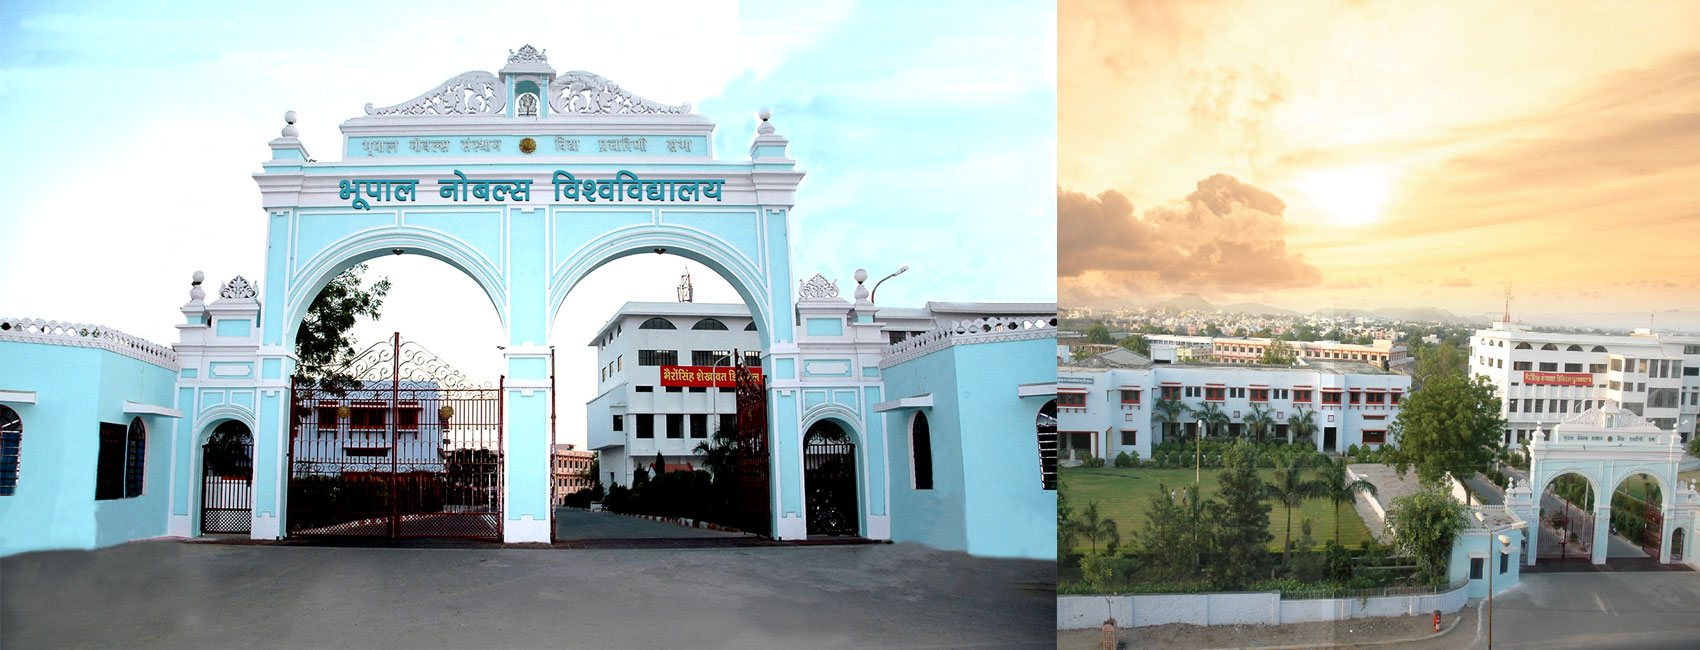 BHUPAL NOBLES' UNIVERSITY